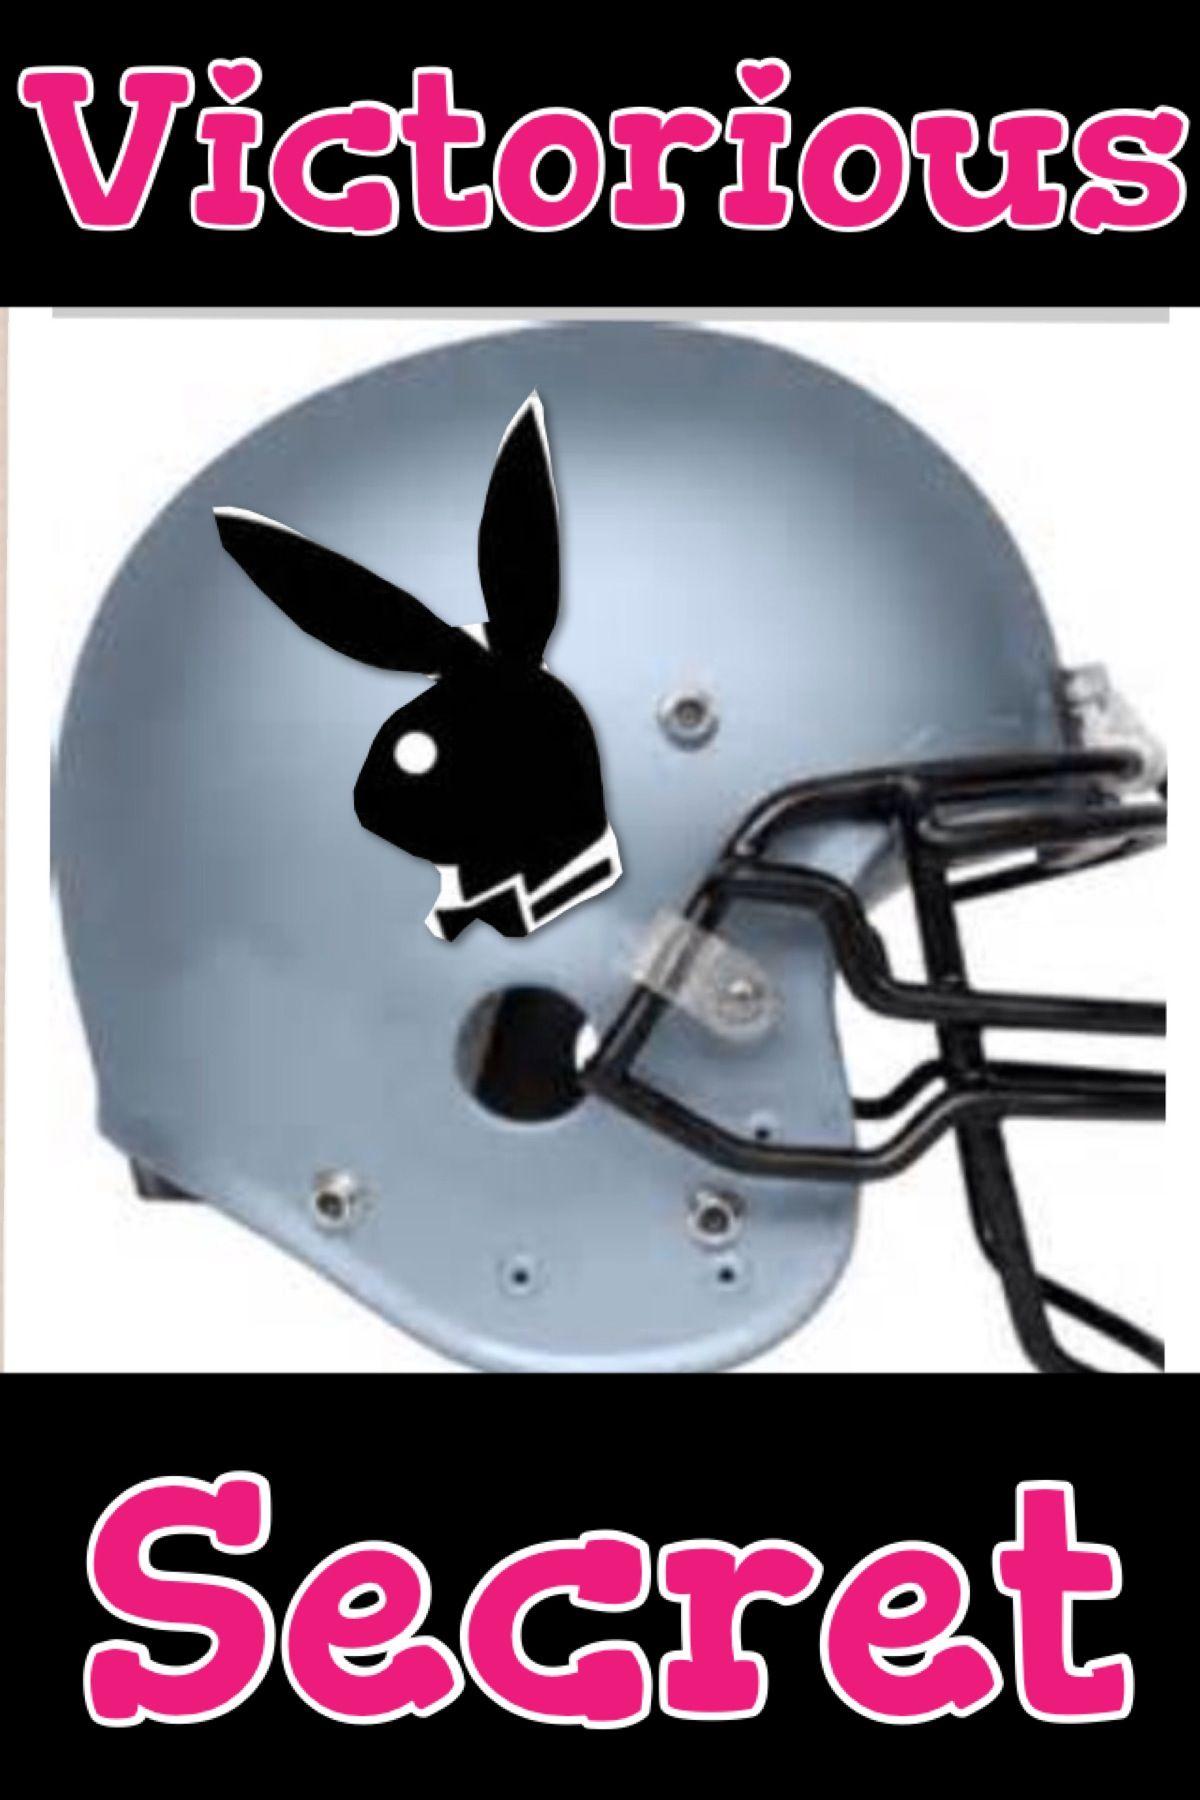 NFL Logos - National Football League Logos - Chris Creamer